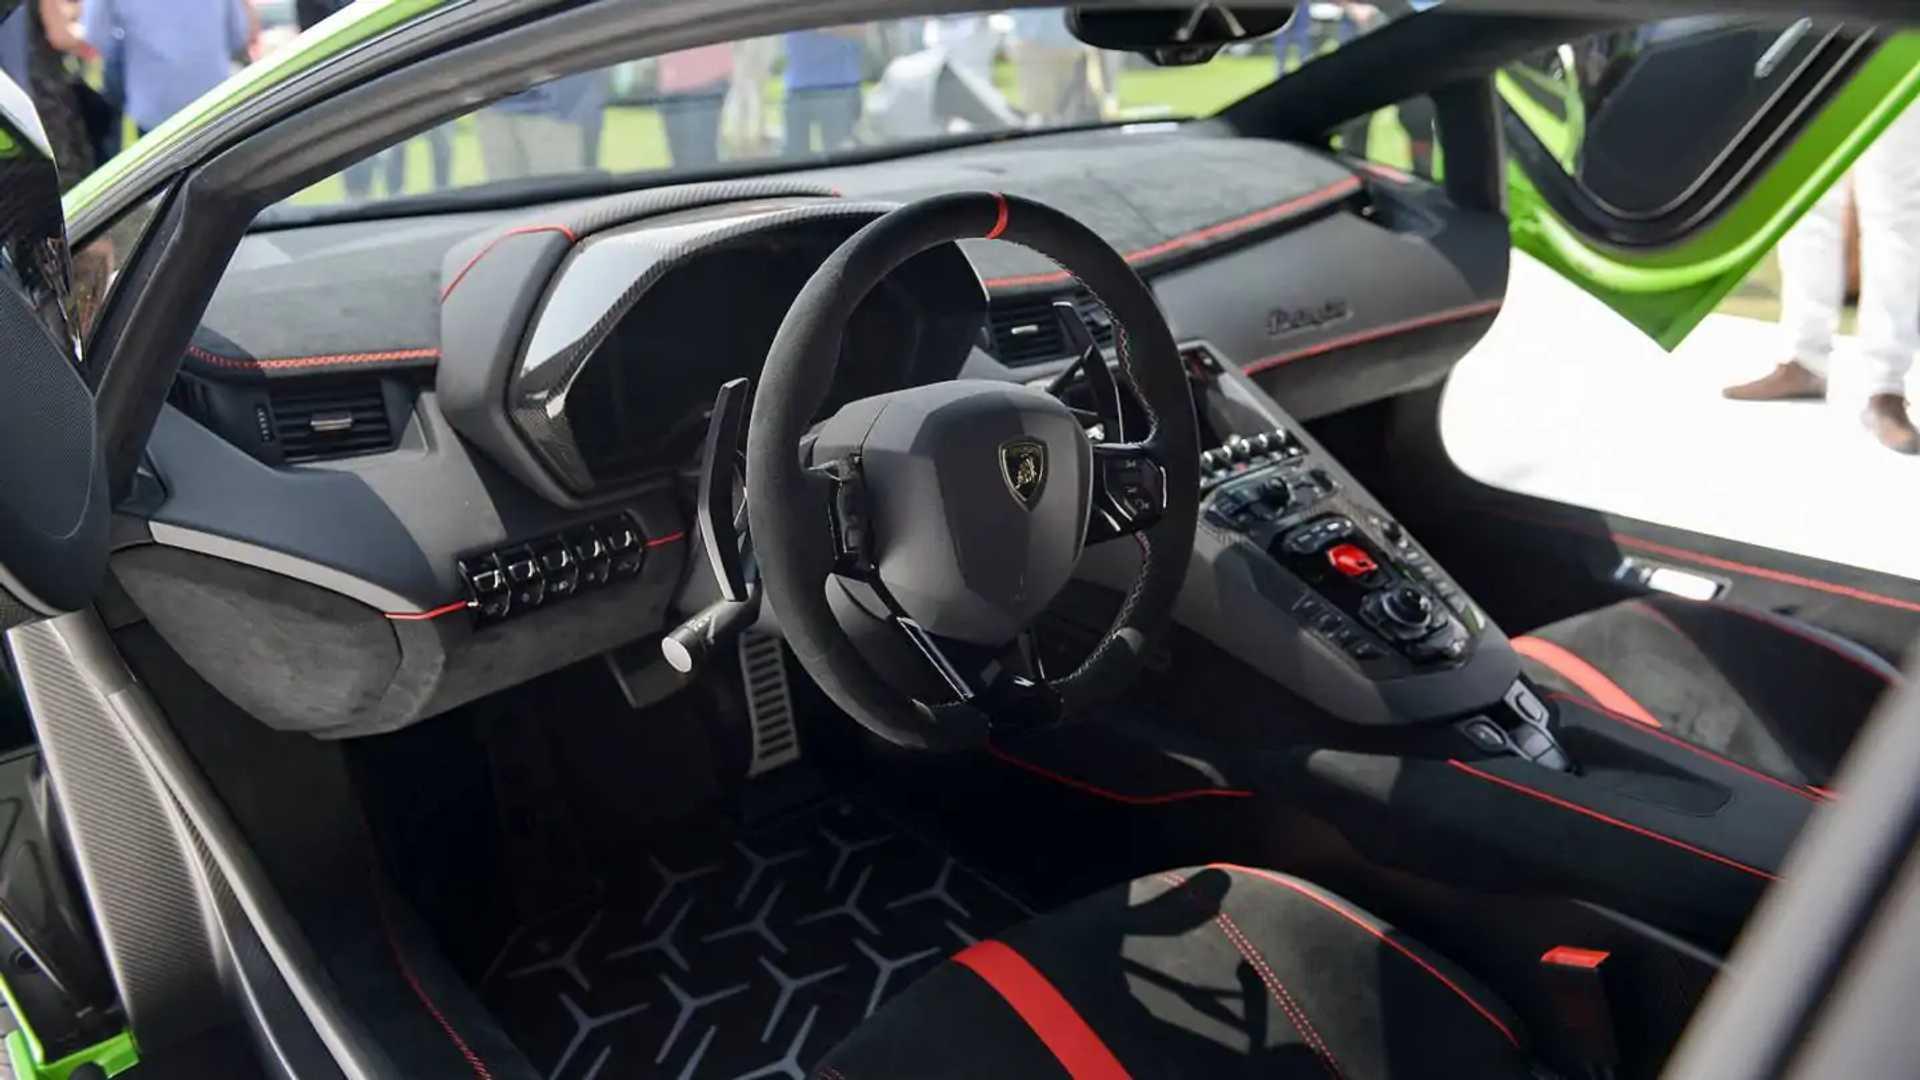 Lamborghini Aventador Svj Is A 770 Hp Track Monster